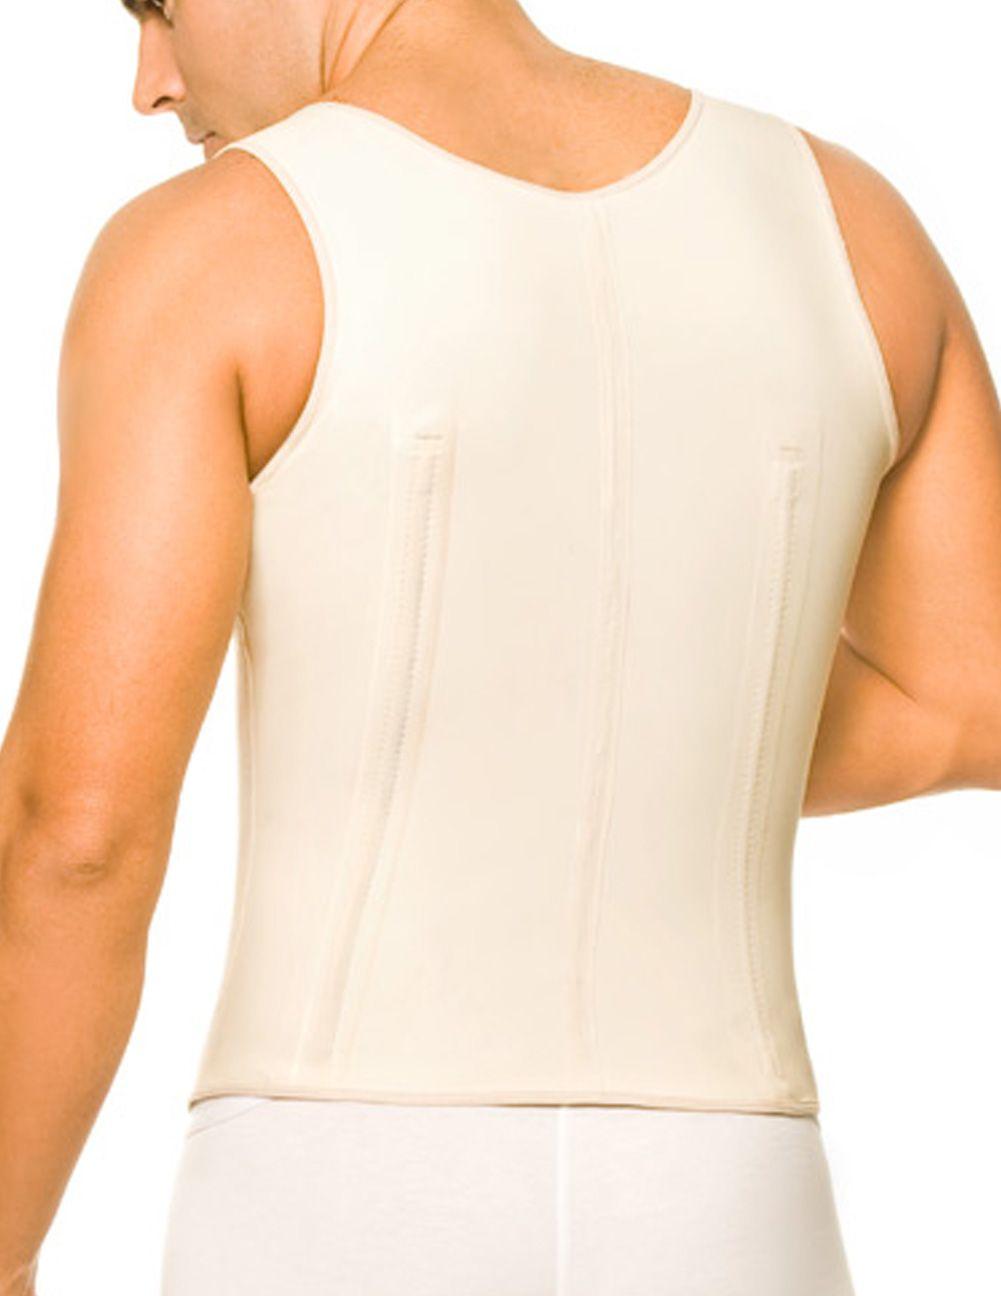 Pin on Shapewear for Men